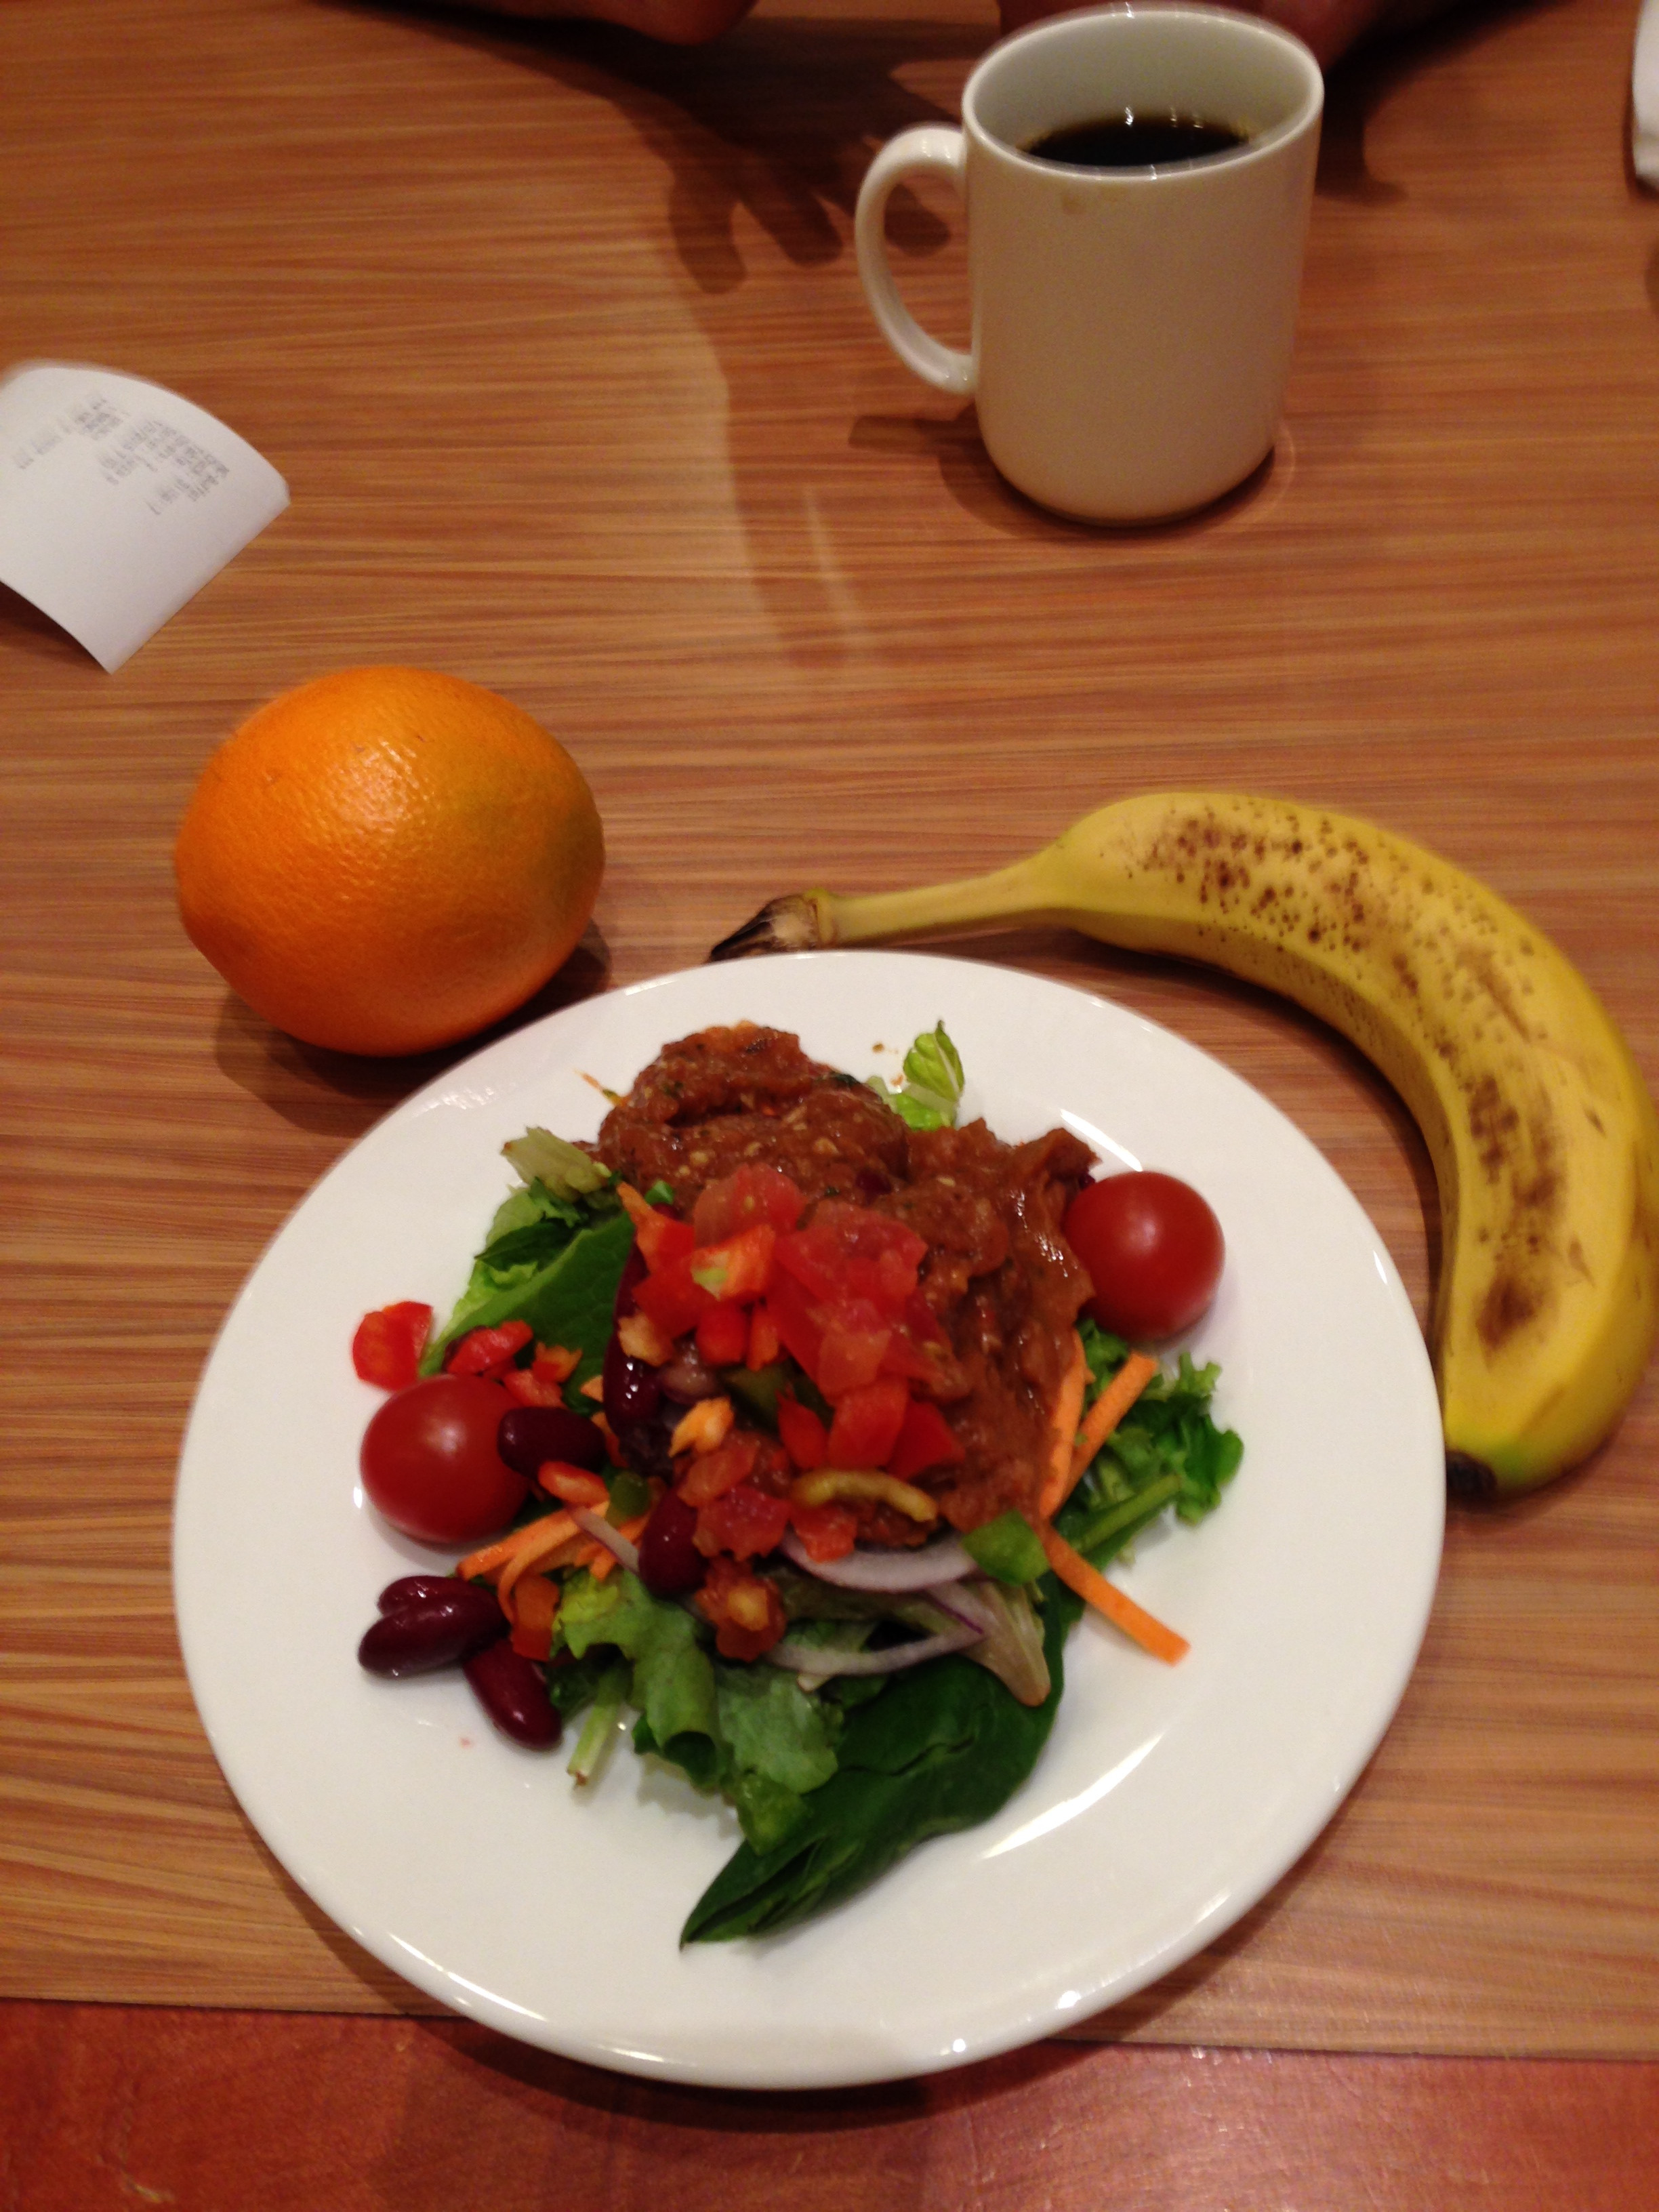 Healthy Breakfast Las Vegas  Eating Healthy on the Las Vegas Strip – Libby Rome